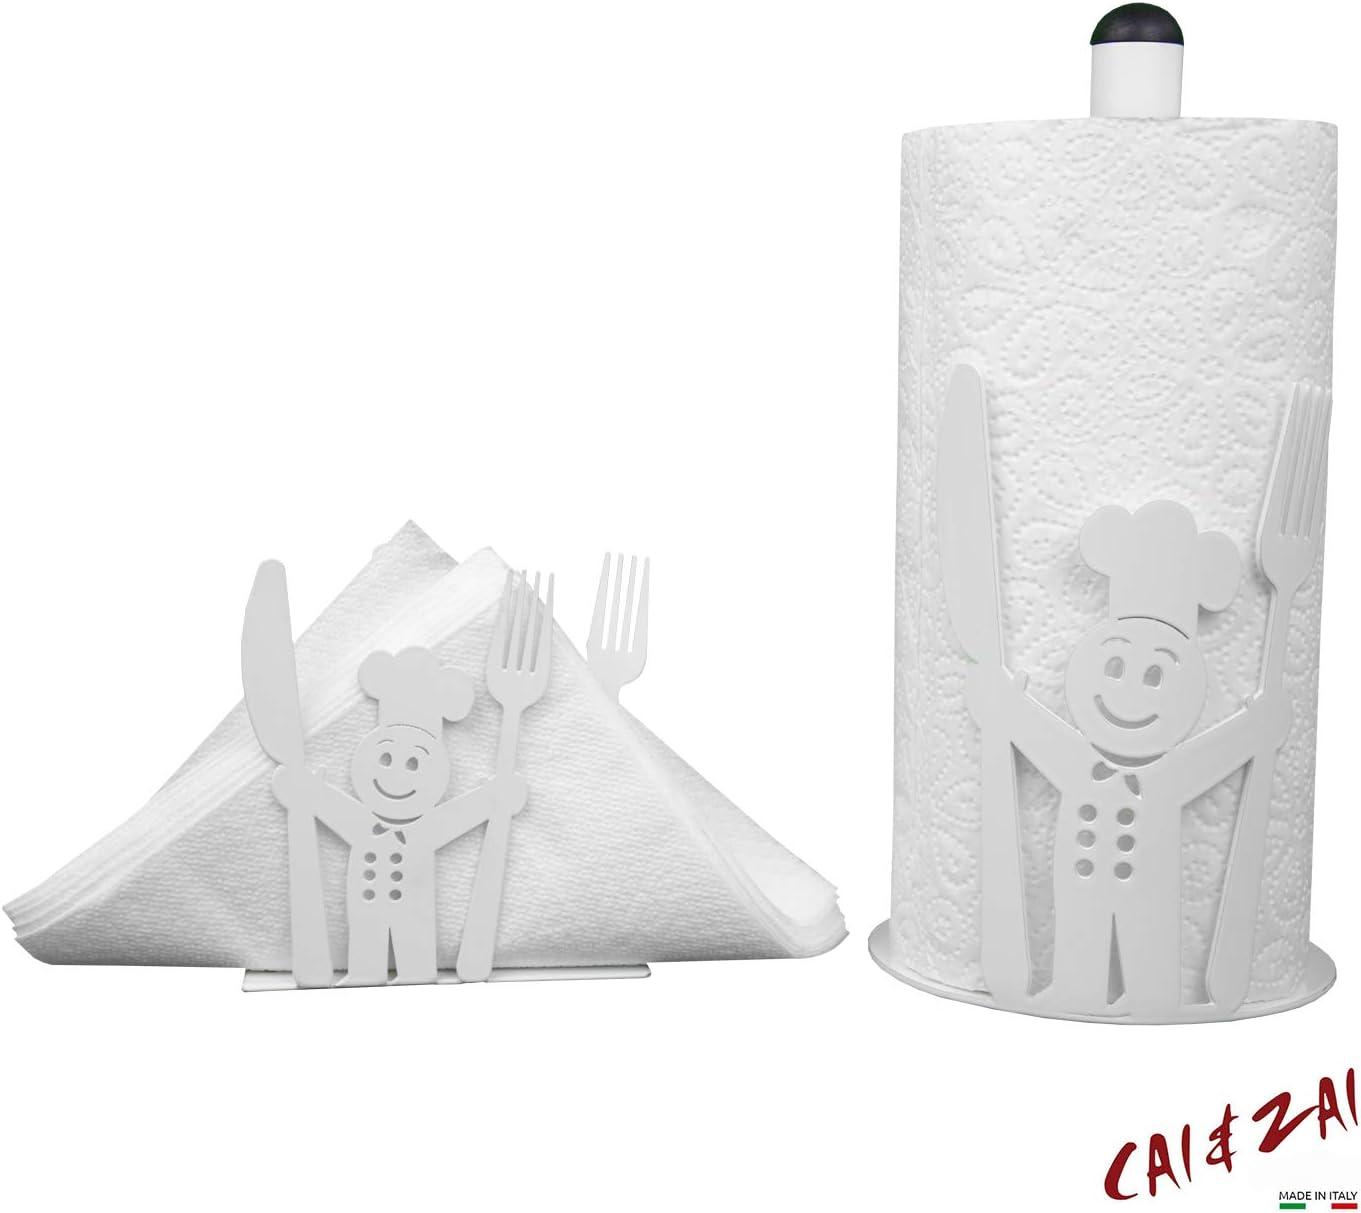 Portascittex CAI /& ZAI-Set Cuoco-Portarrollos /& Servilletero-Dise/ño-Made in Itaty